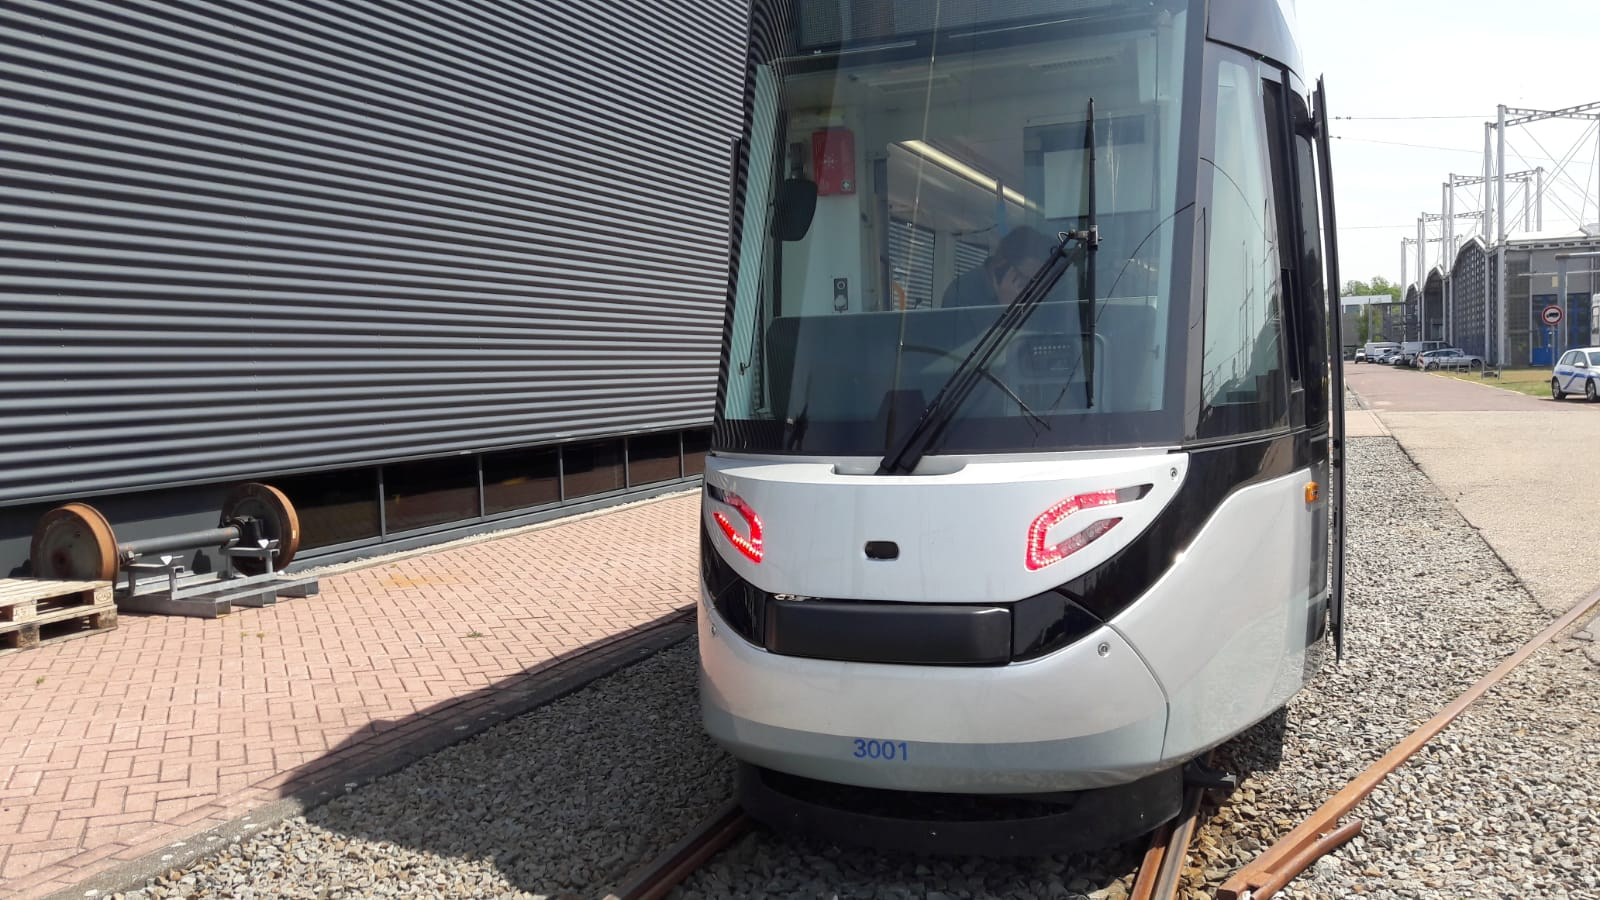 eerste 15G tram grootwagennummer 3001